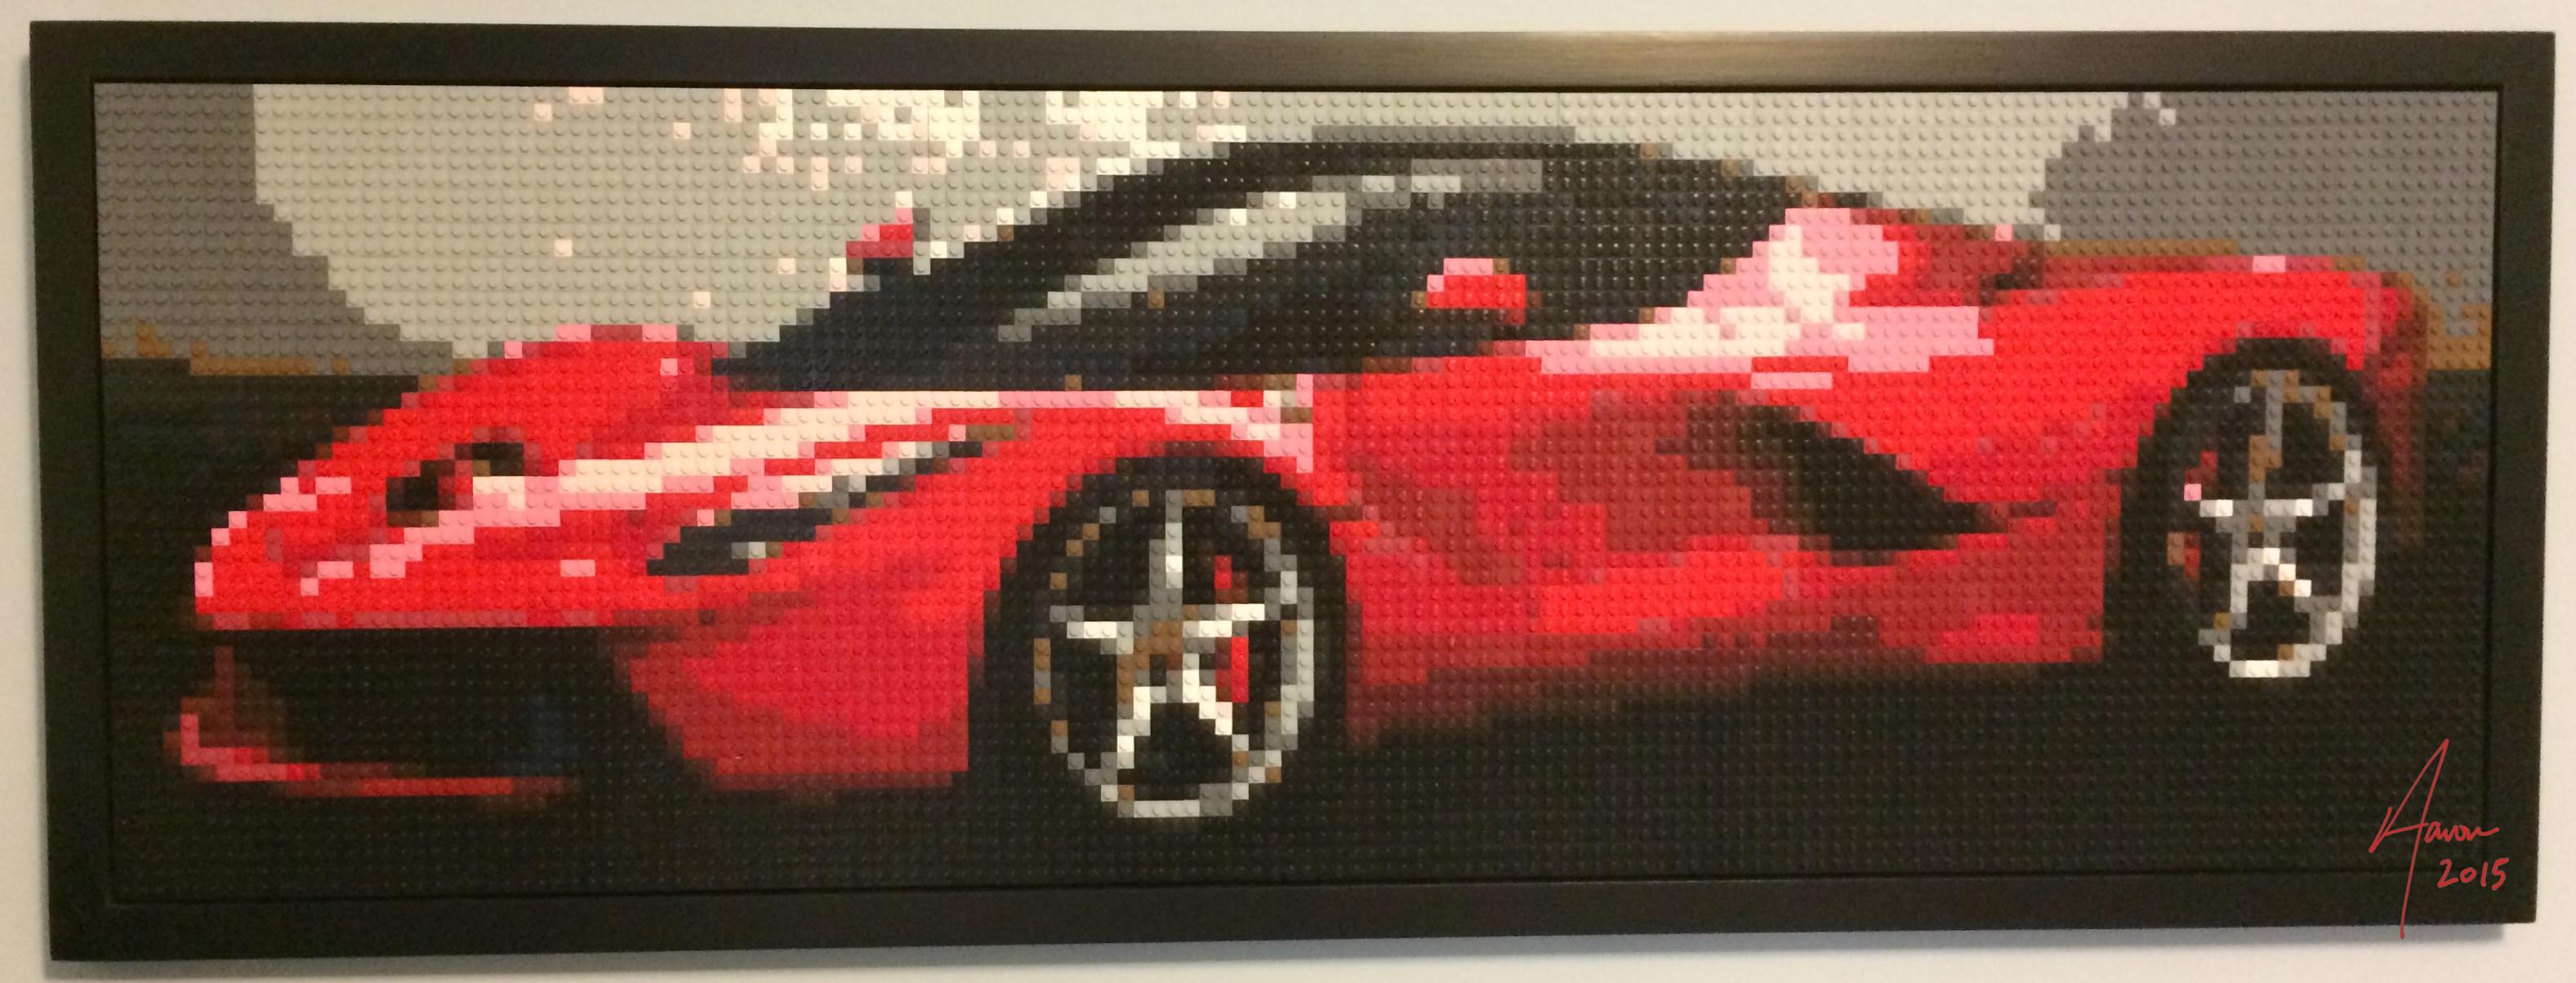 La Ferrari LEGO mosaic